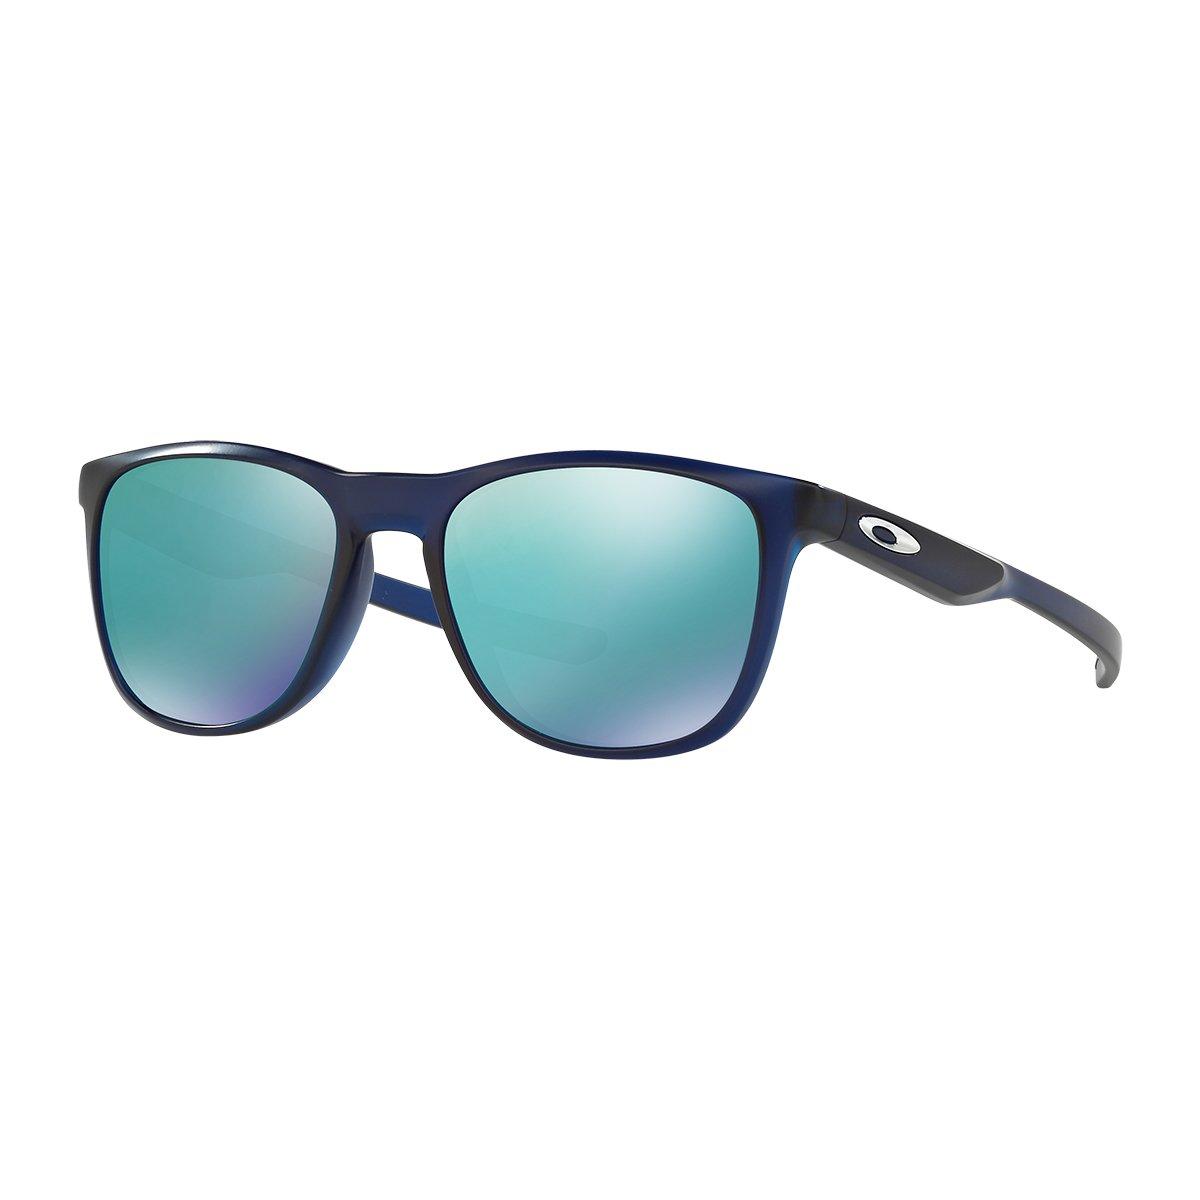 Oakley Men's Trillbe X Non-Polarized Iridium Rectangular Sunglasses MATTE TRANSLUCENT BLUE I 52 mm